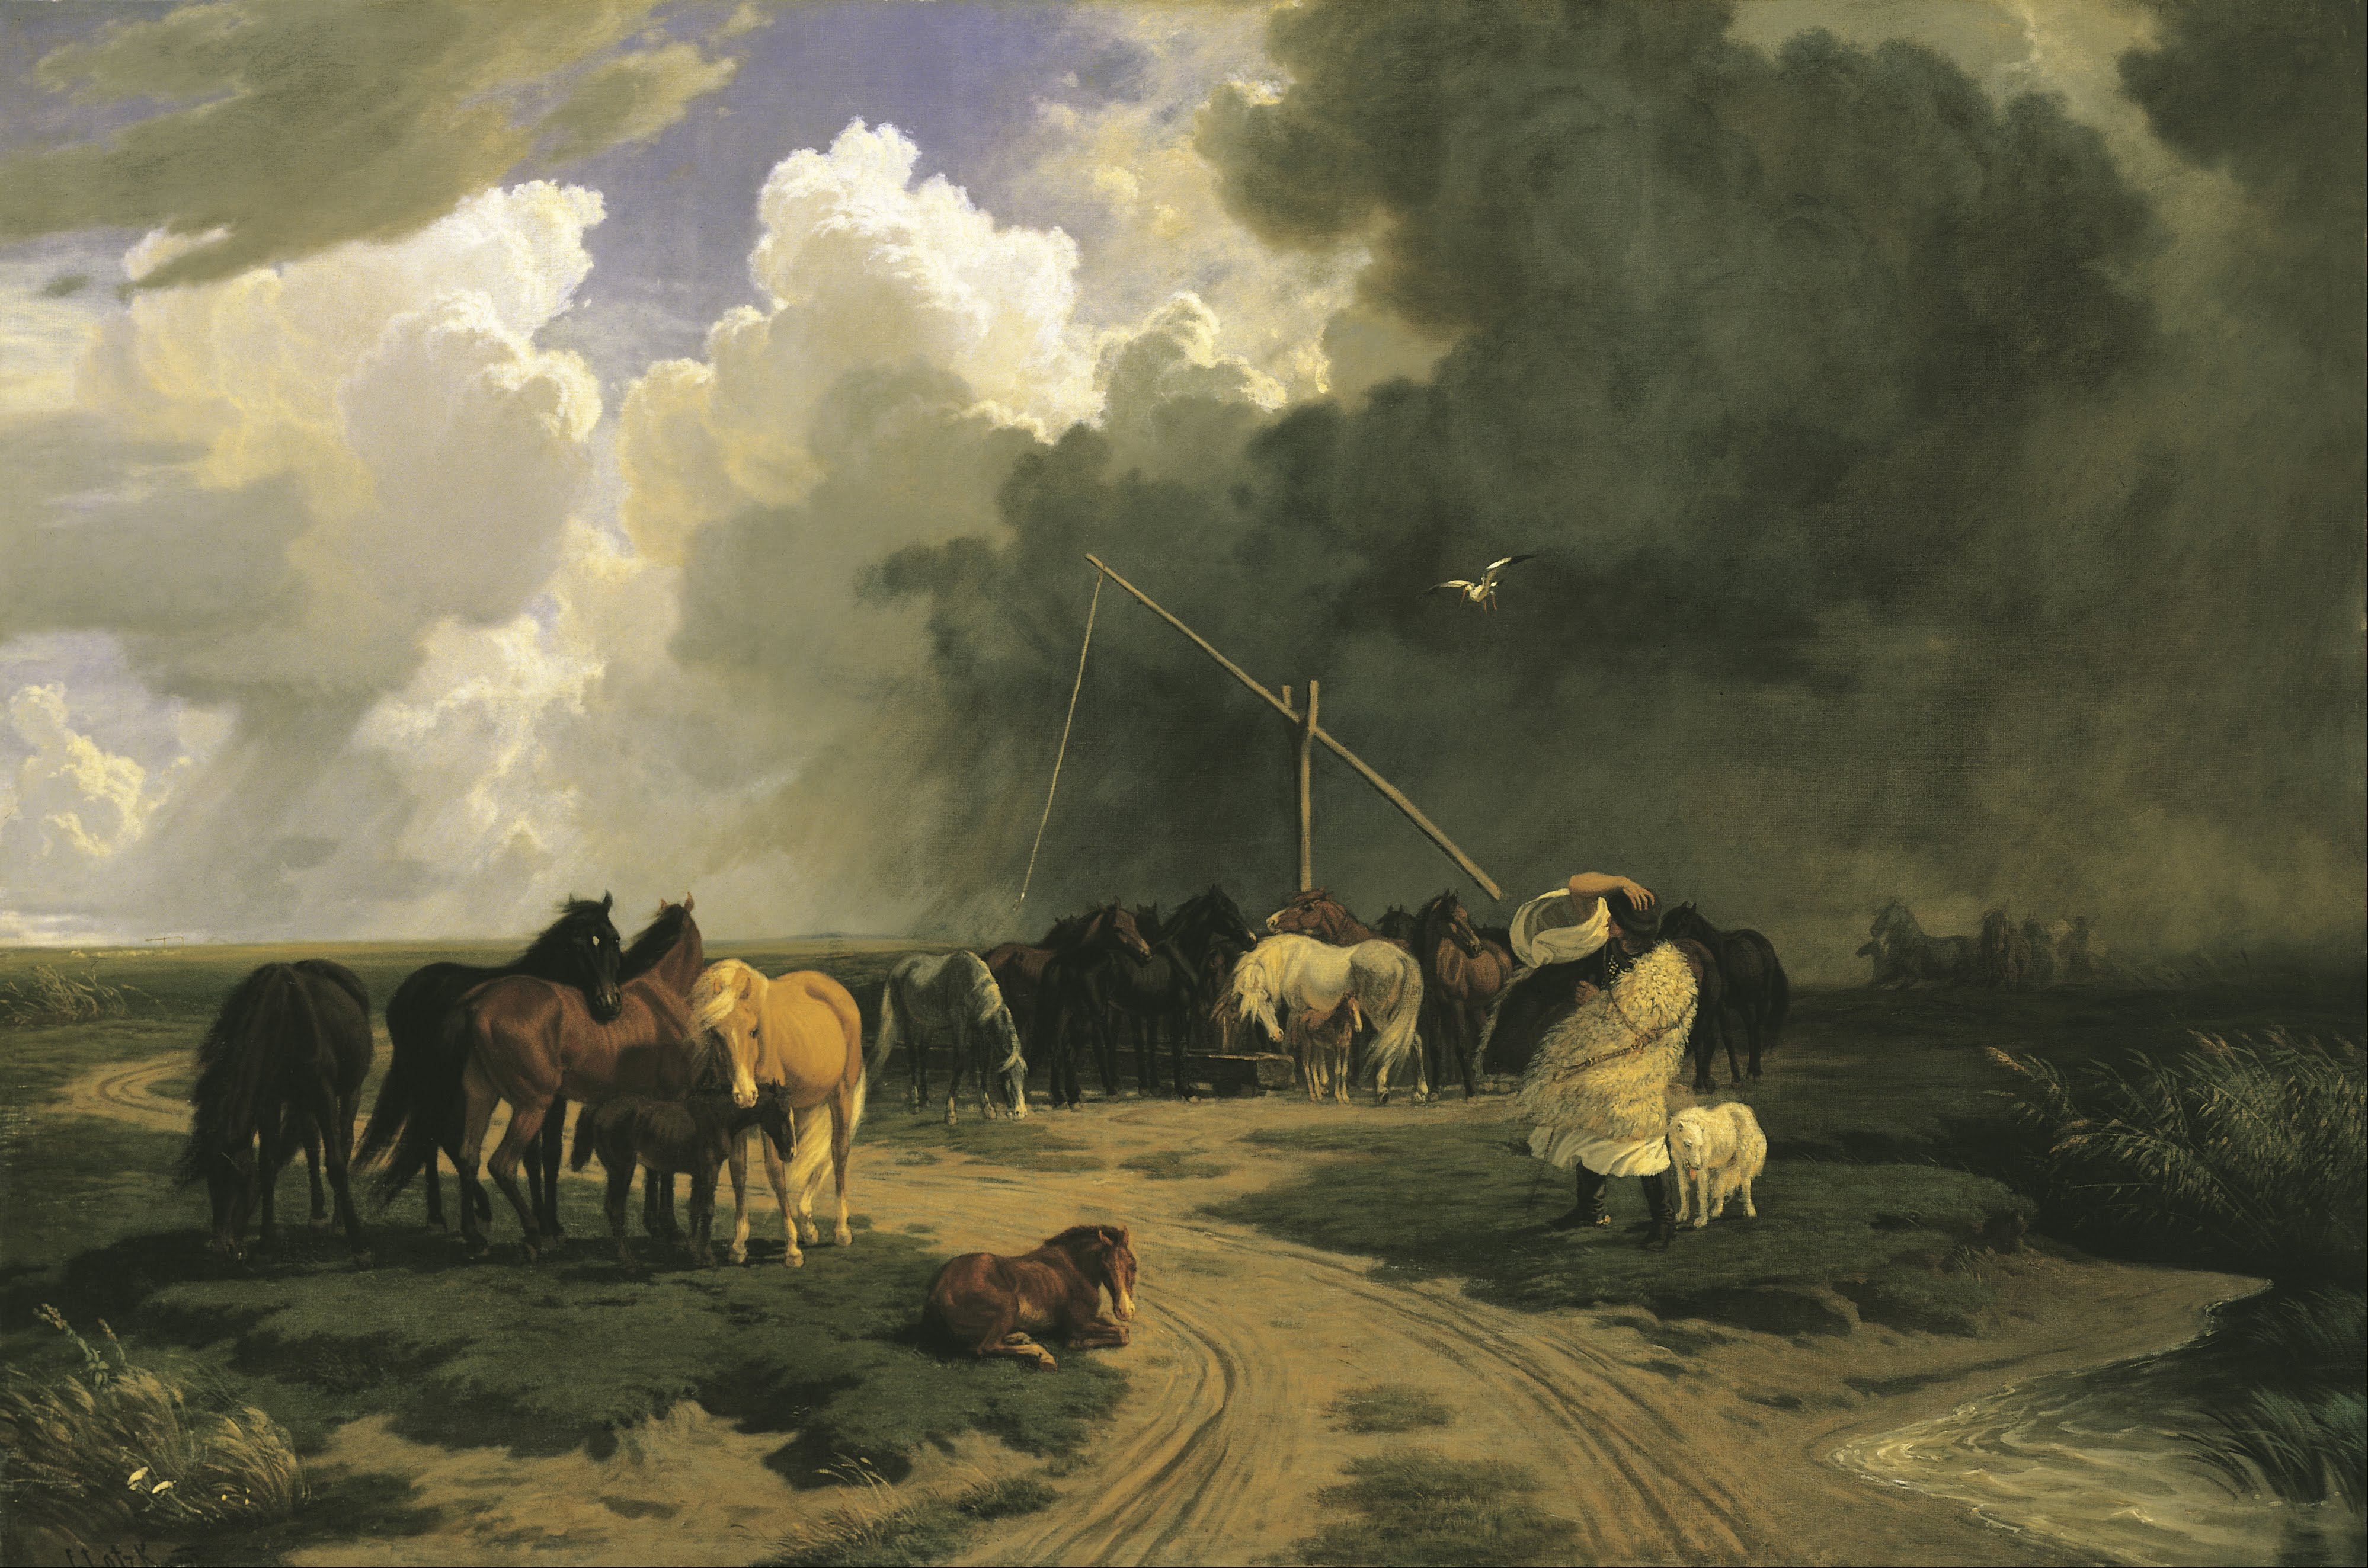 Google Fall Wallpaper File Lotz K 225 Roly Horses In A Rainstorm Google Art